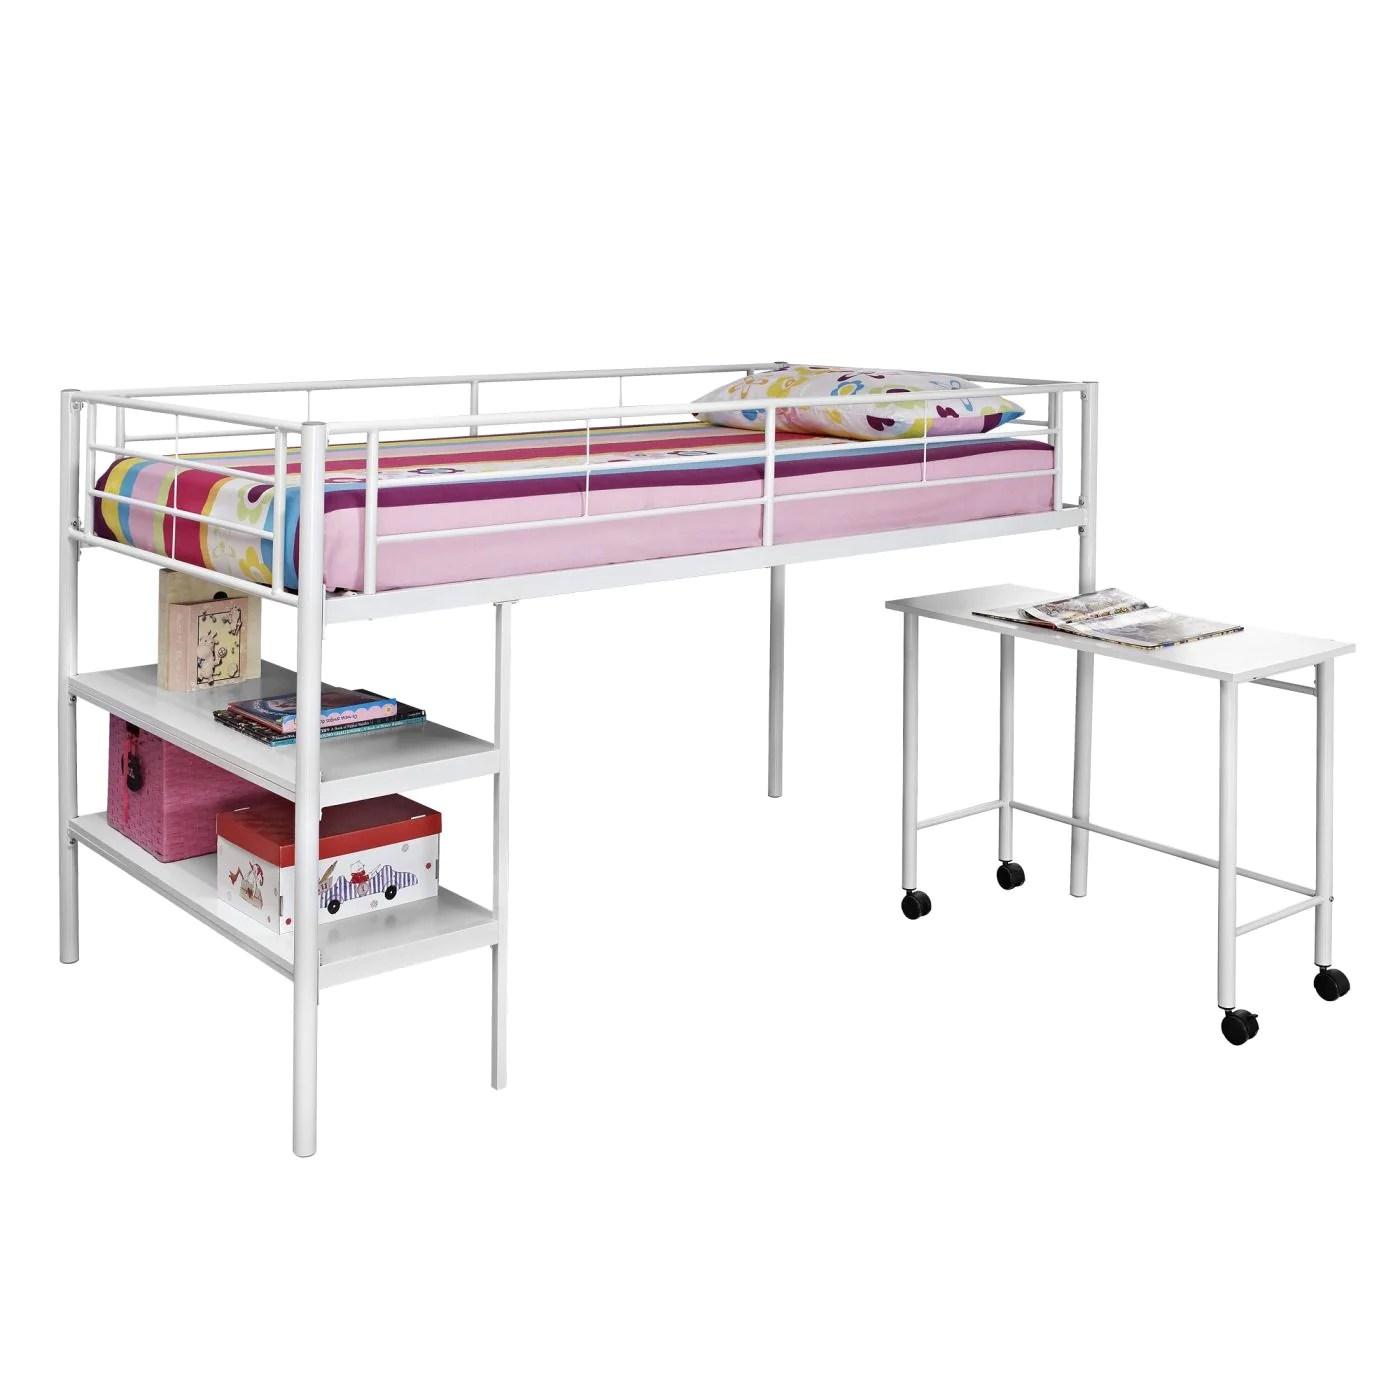 Fullsize Of Low Loft Bed